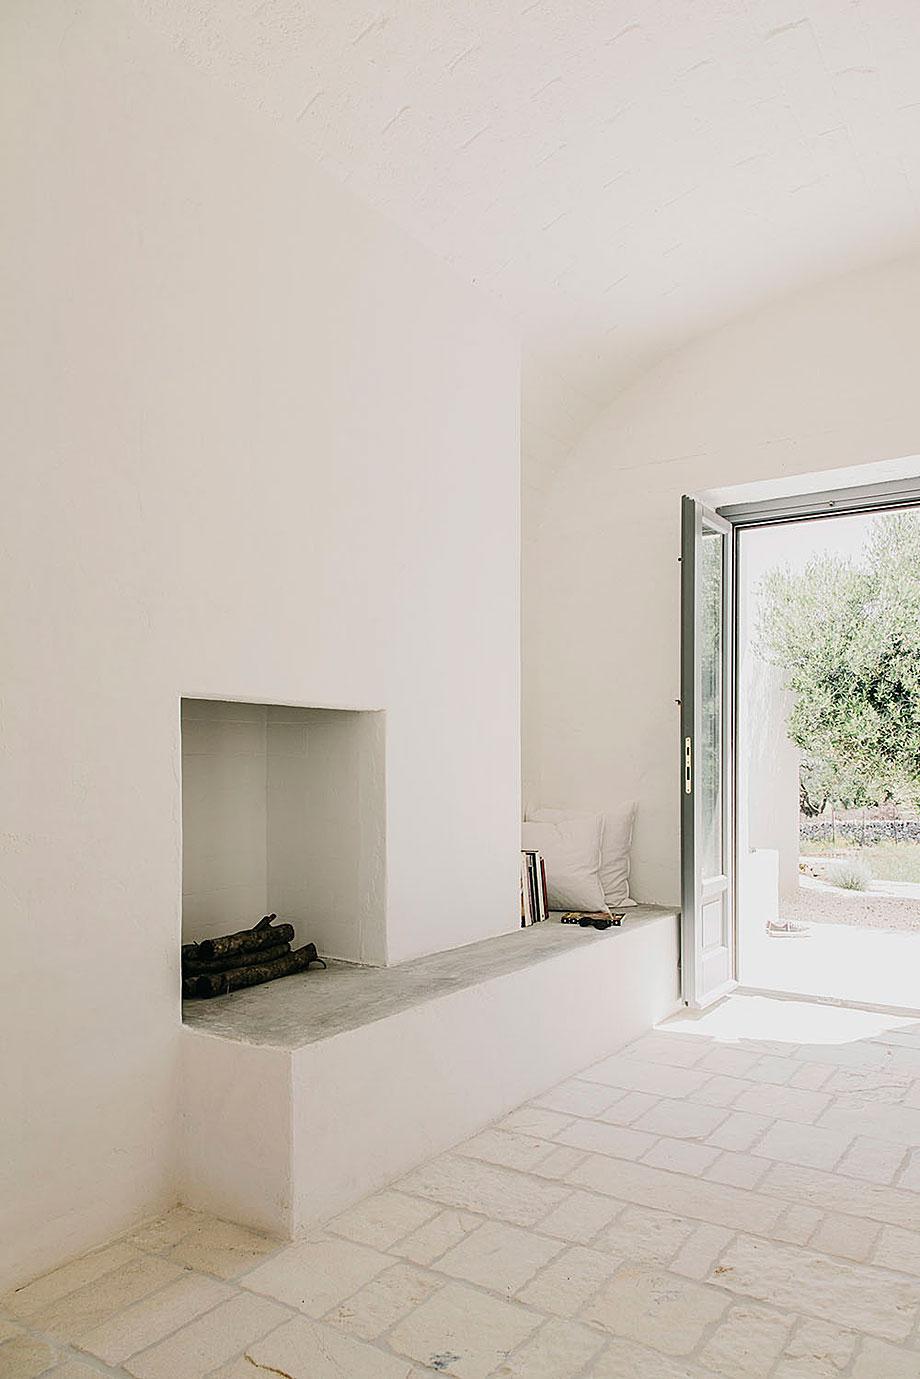 masseria-moroseta-andrew-trotter-architecture-puglia-ostuni-openhouse-20